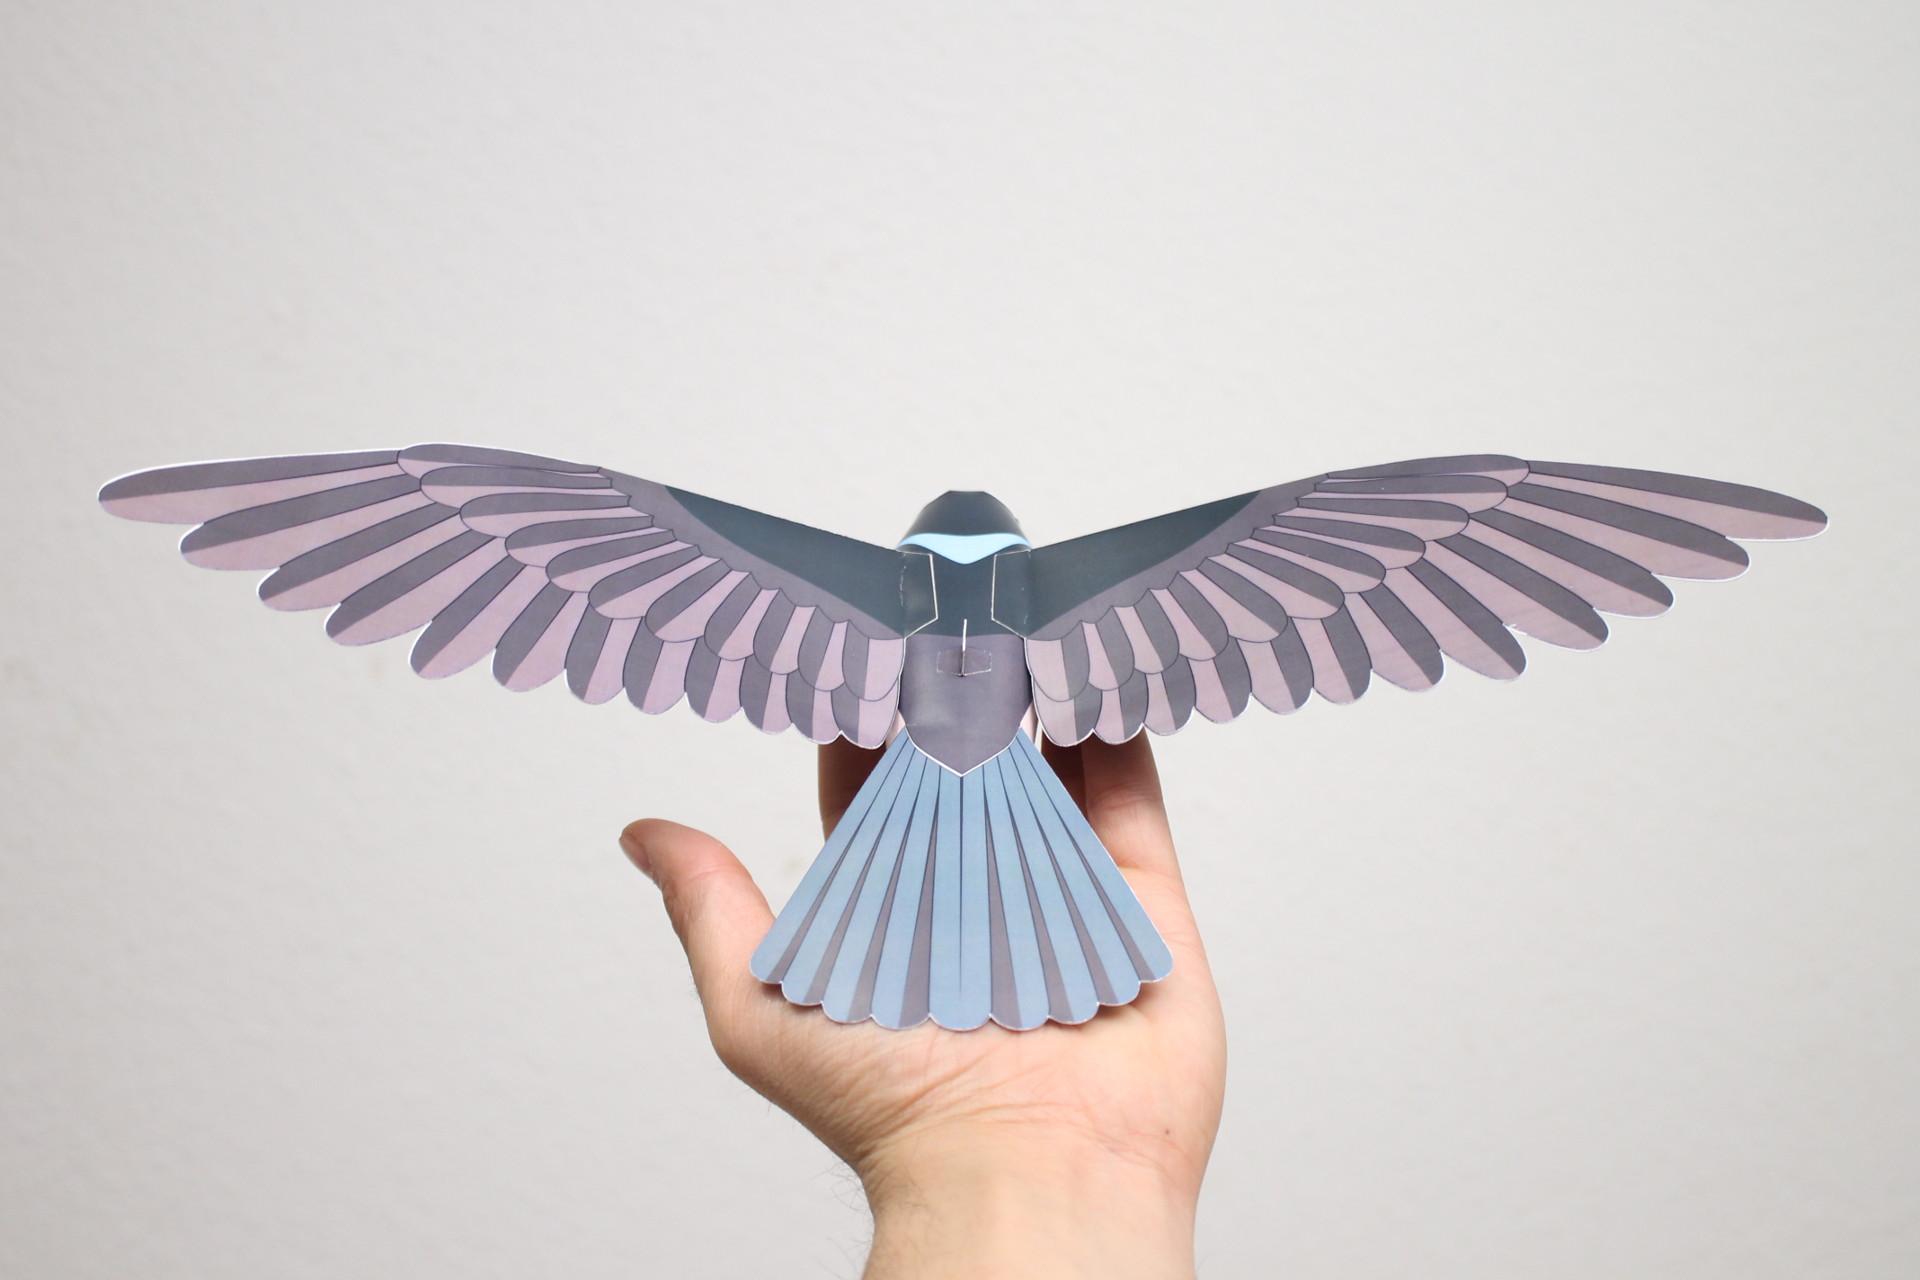 Prachtstaffelschwanz aus Papier